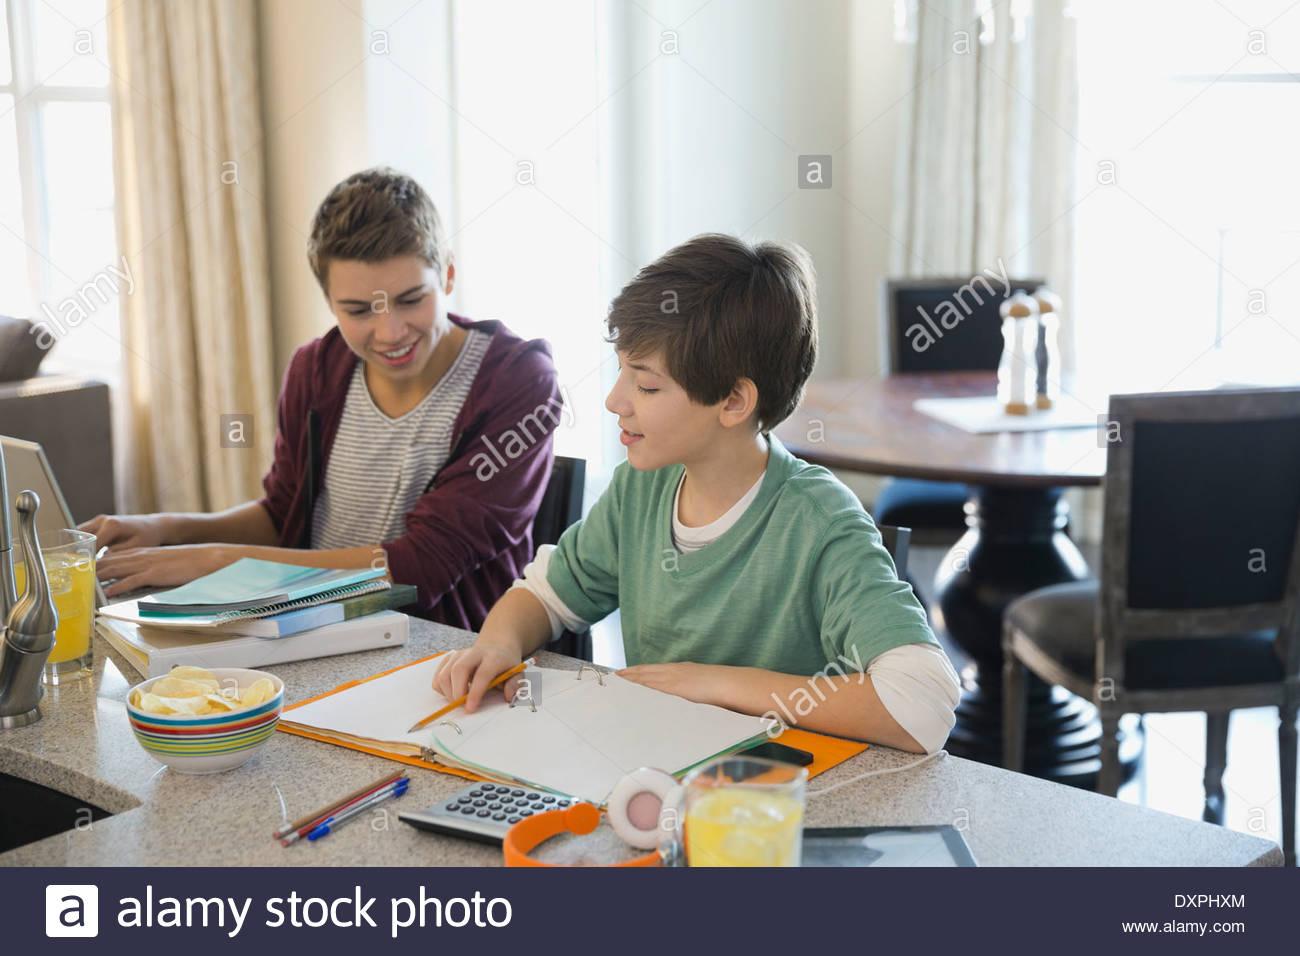 Sibling working on homework - Stock Image